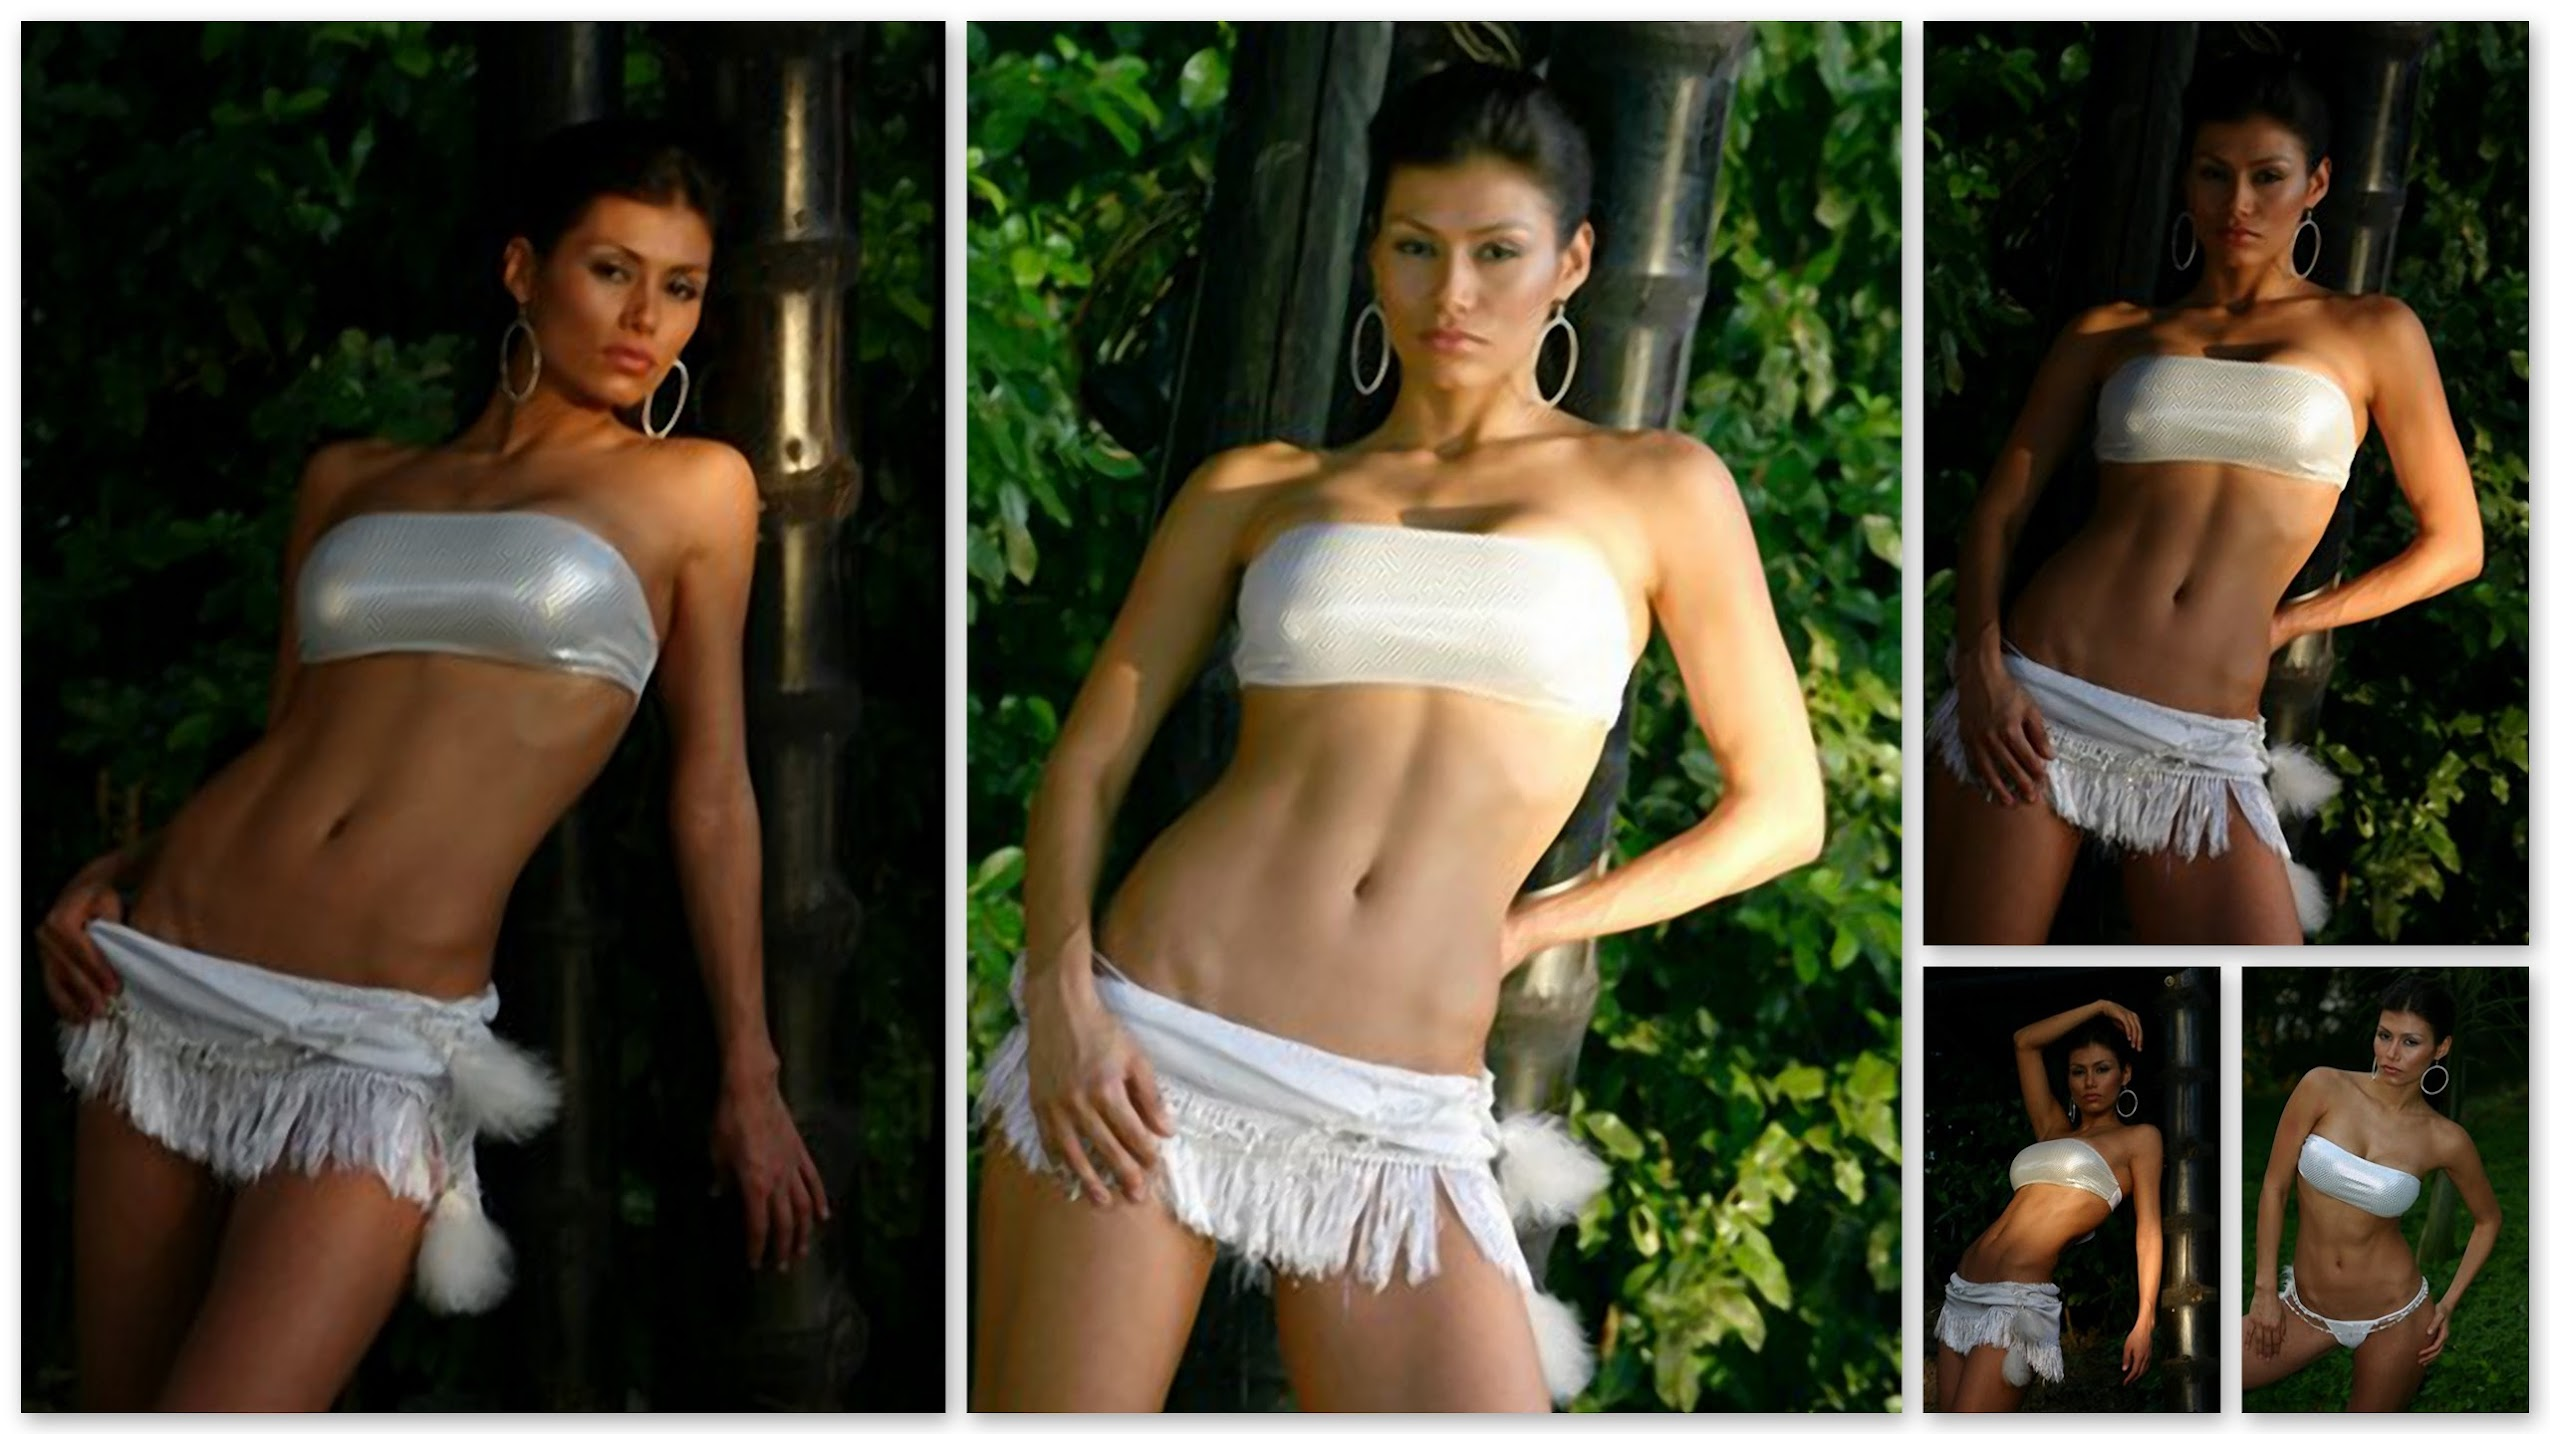 Renata Gonzalez Fotos En Minifalda Blanca y Bikini Blanco Foto 1